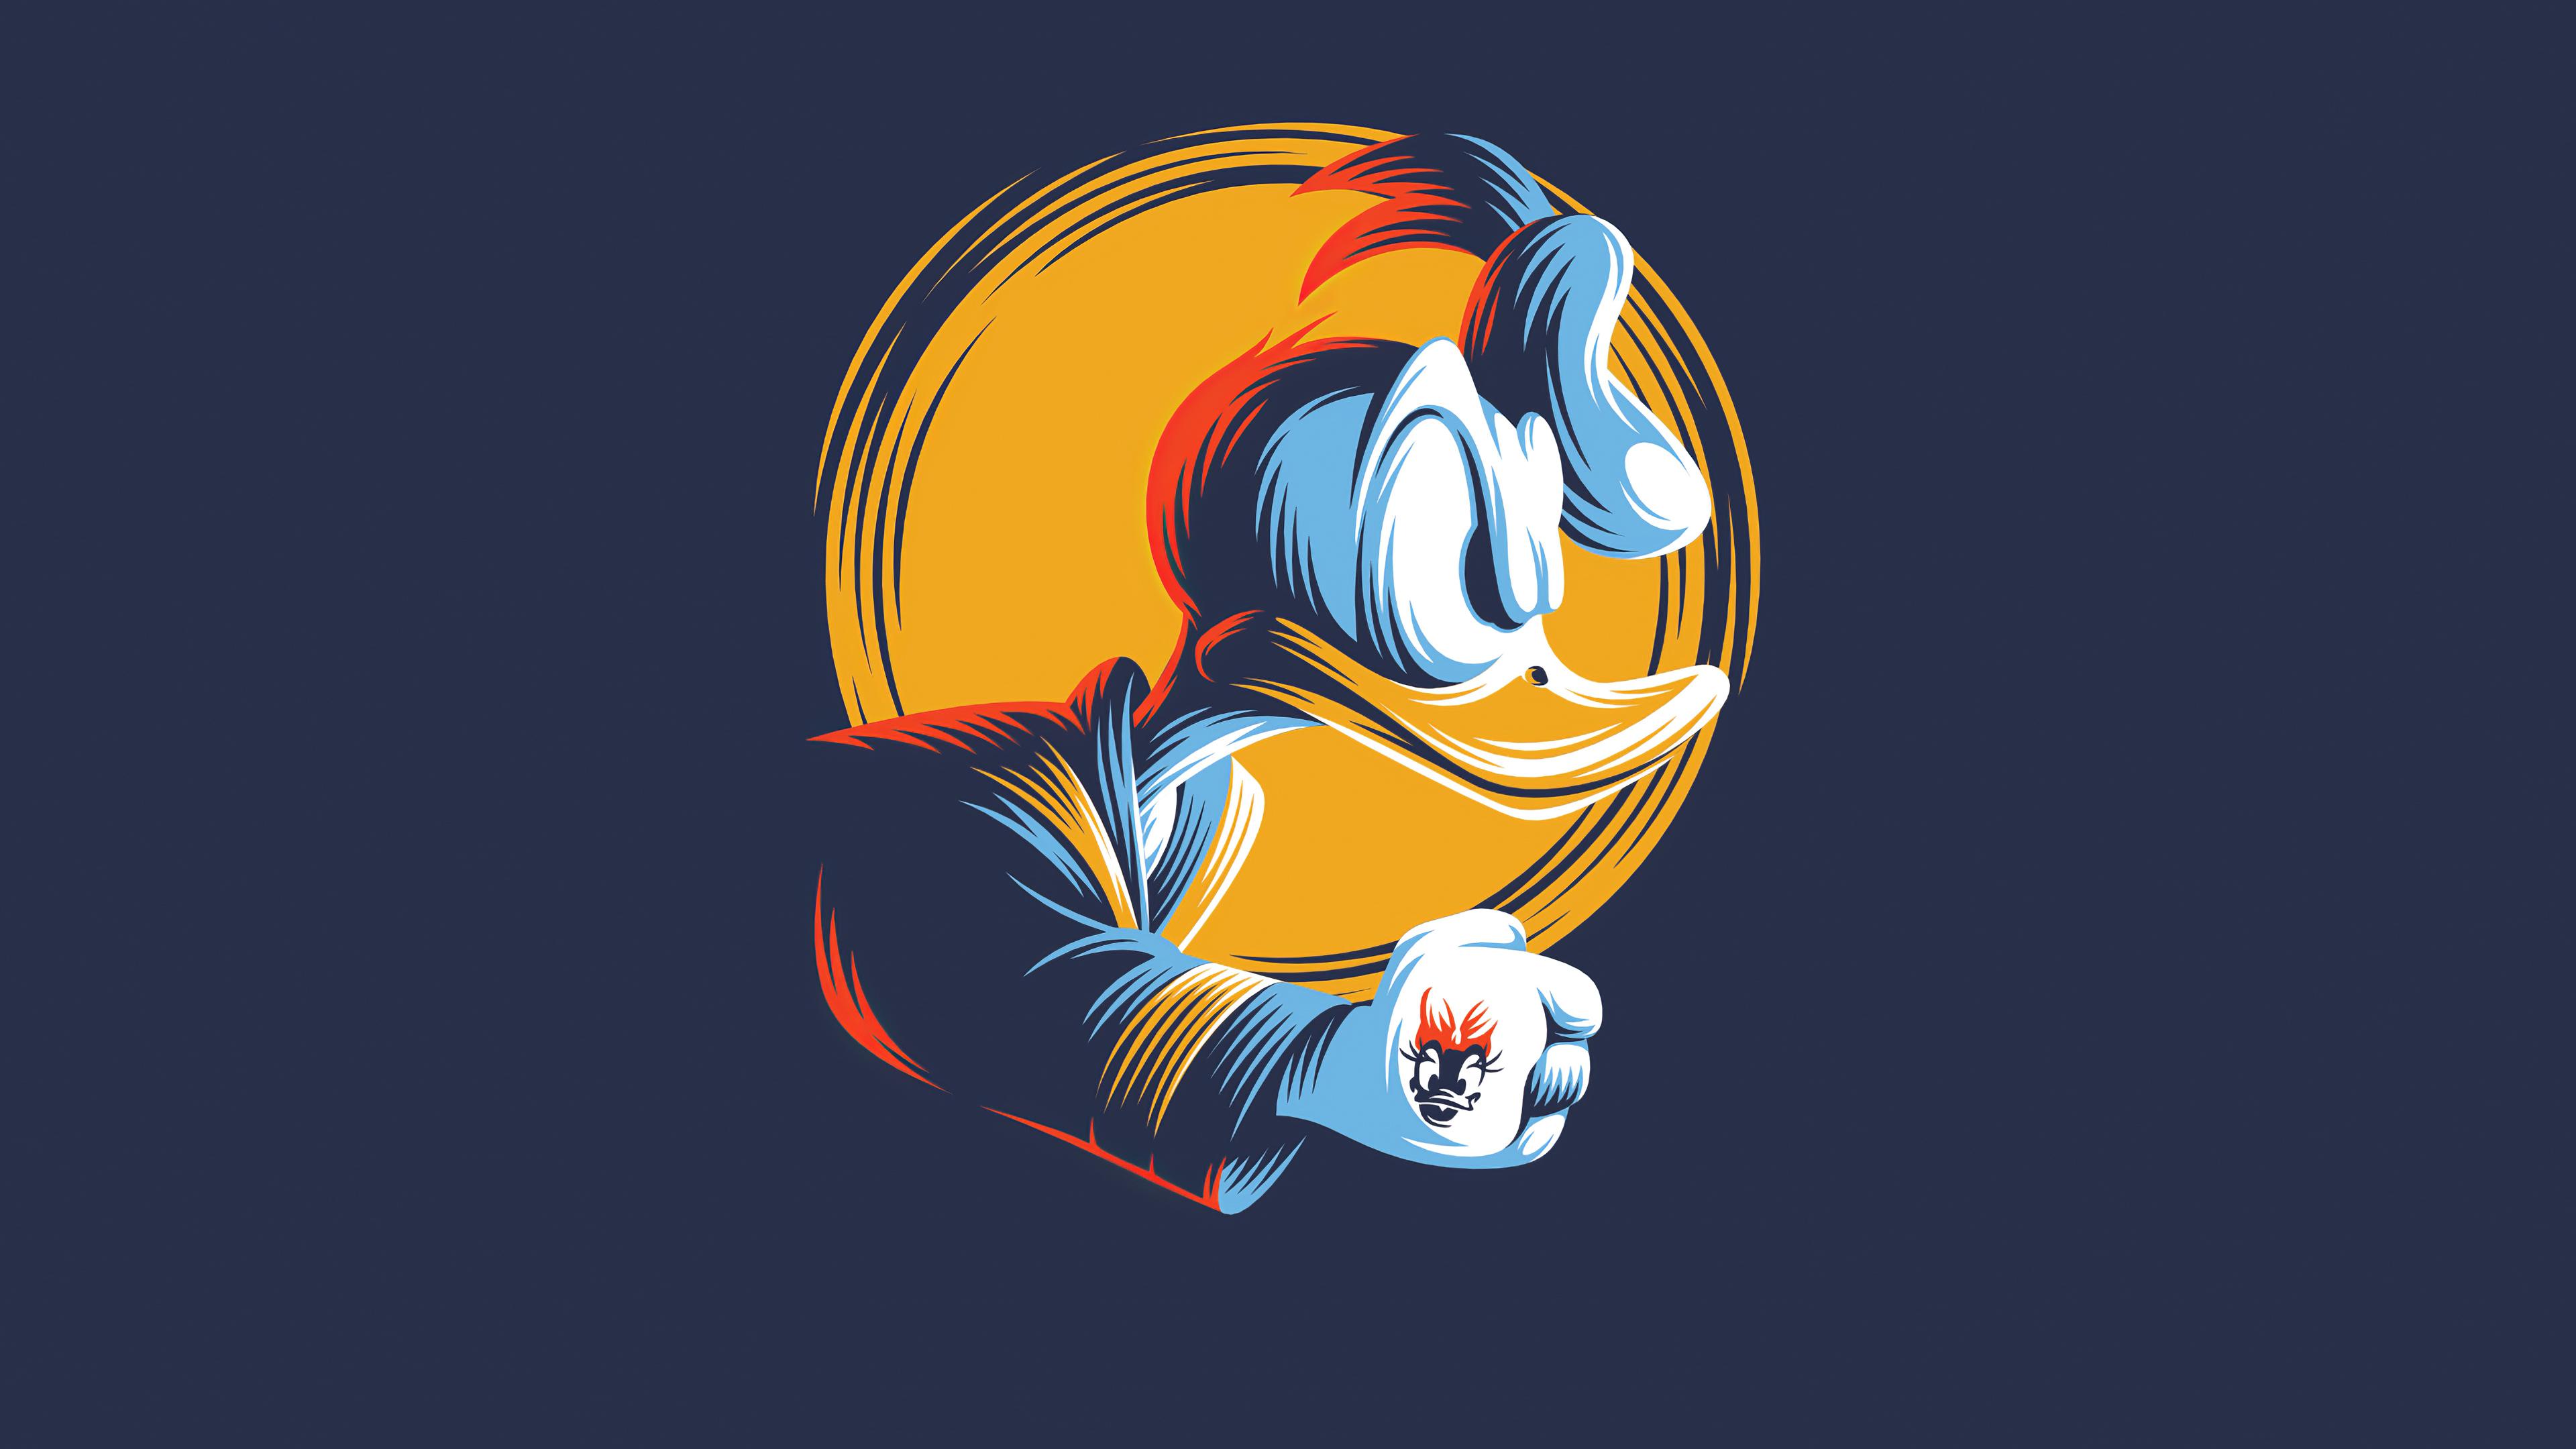 Donald Duck Minimal Art 4k Hd Cartoons 4k Wallpapers Images